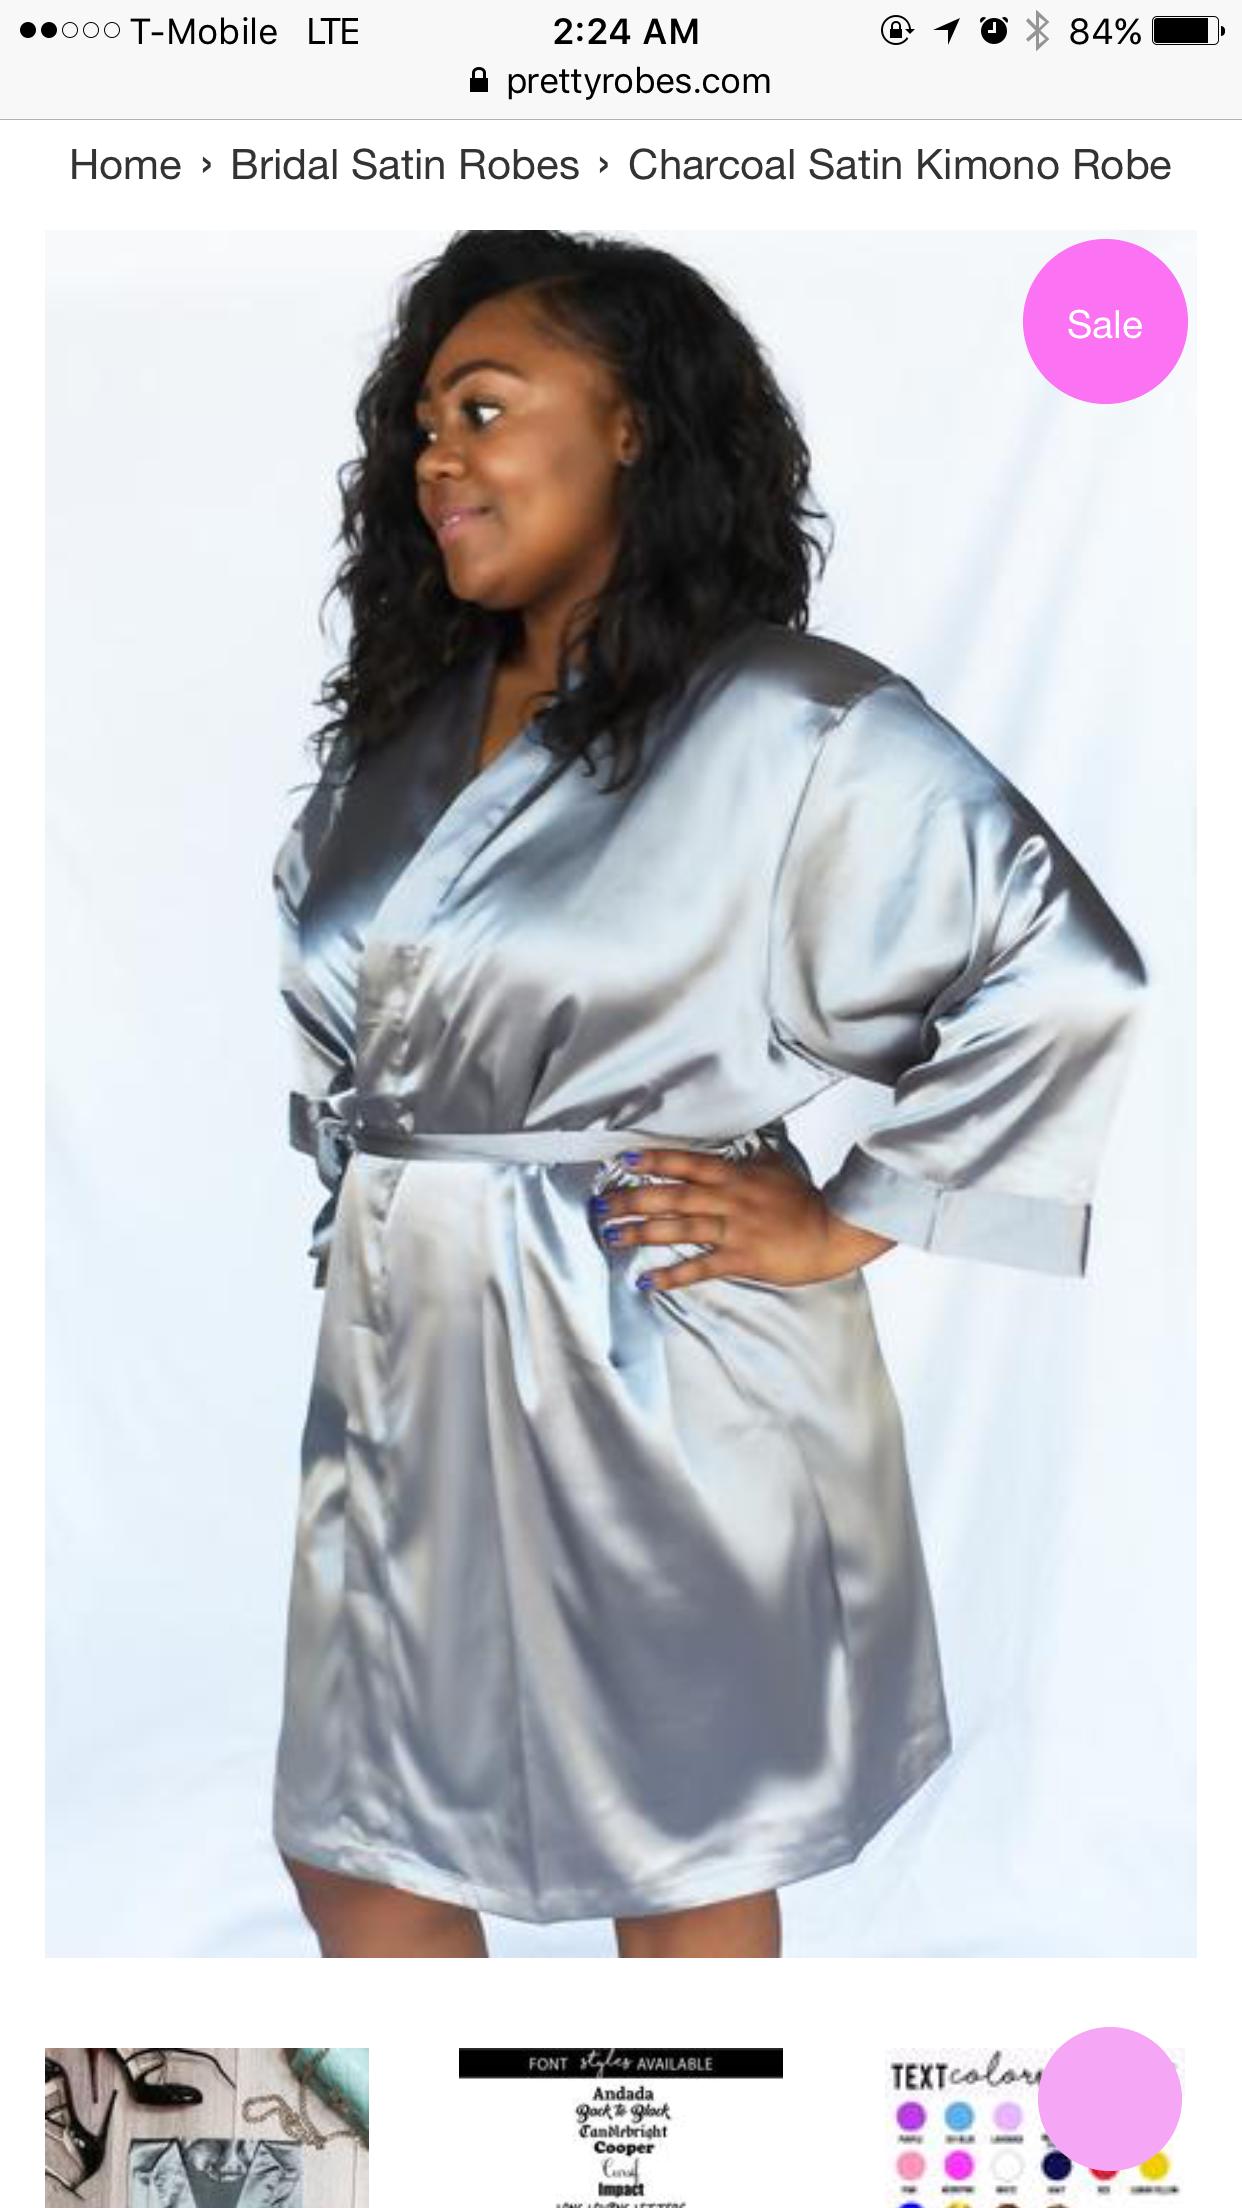 c5d2758ae1ee Bridesmaid Robes, Bridesmaids, Shoulder Sleeve, Belt Tying, Wrap Dress,  Neckline,